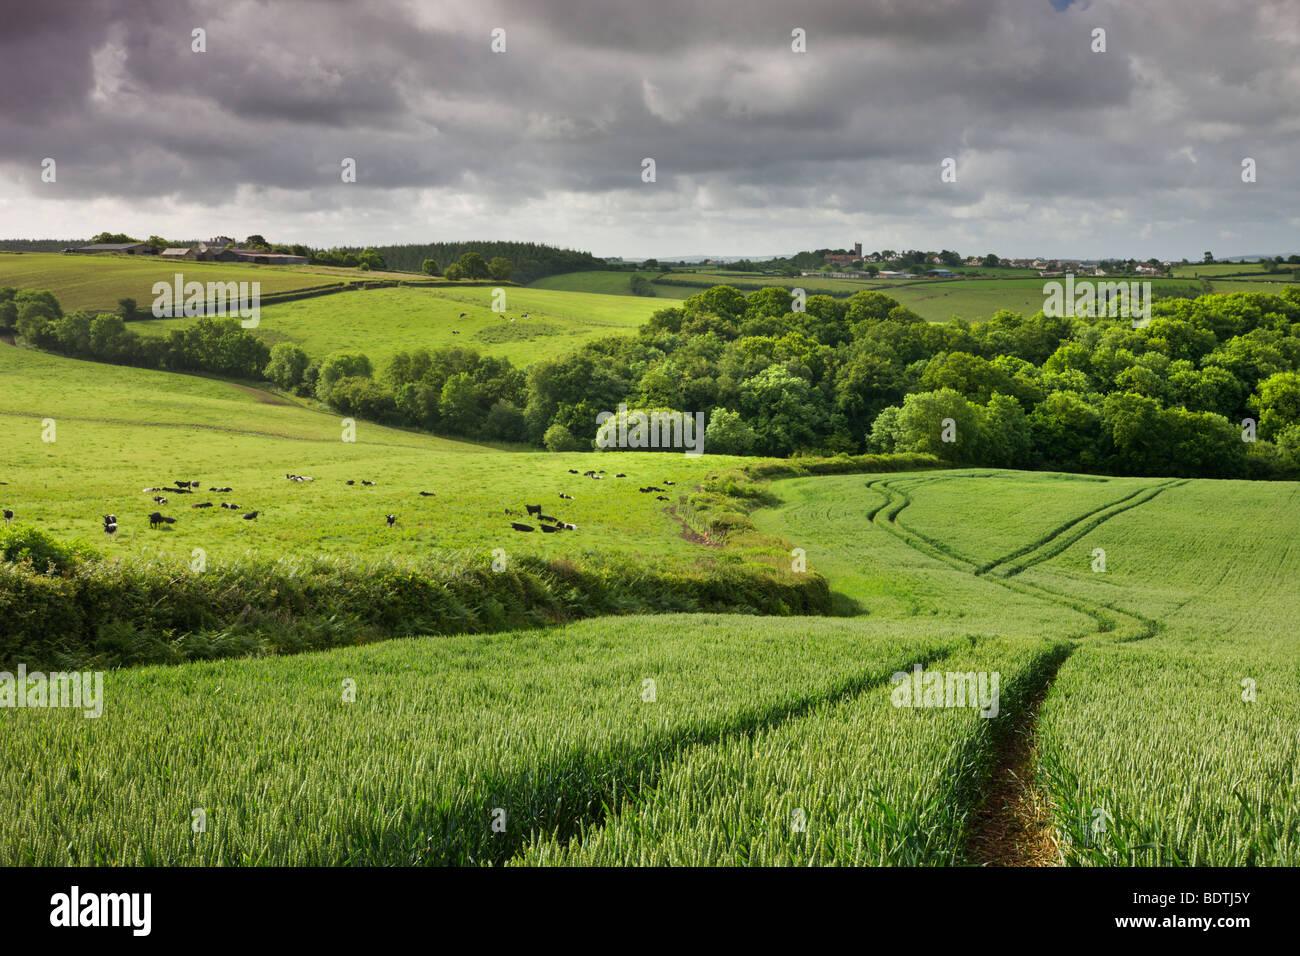 Farmland in summertime, Morchard Bishop, Devon, England. Summer (June) 2009 - Stock Image